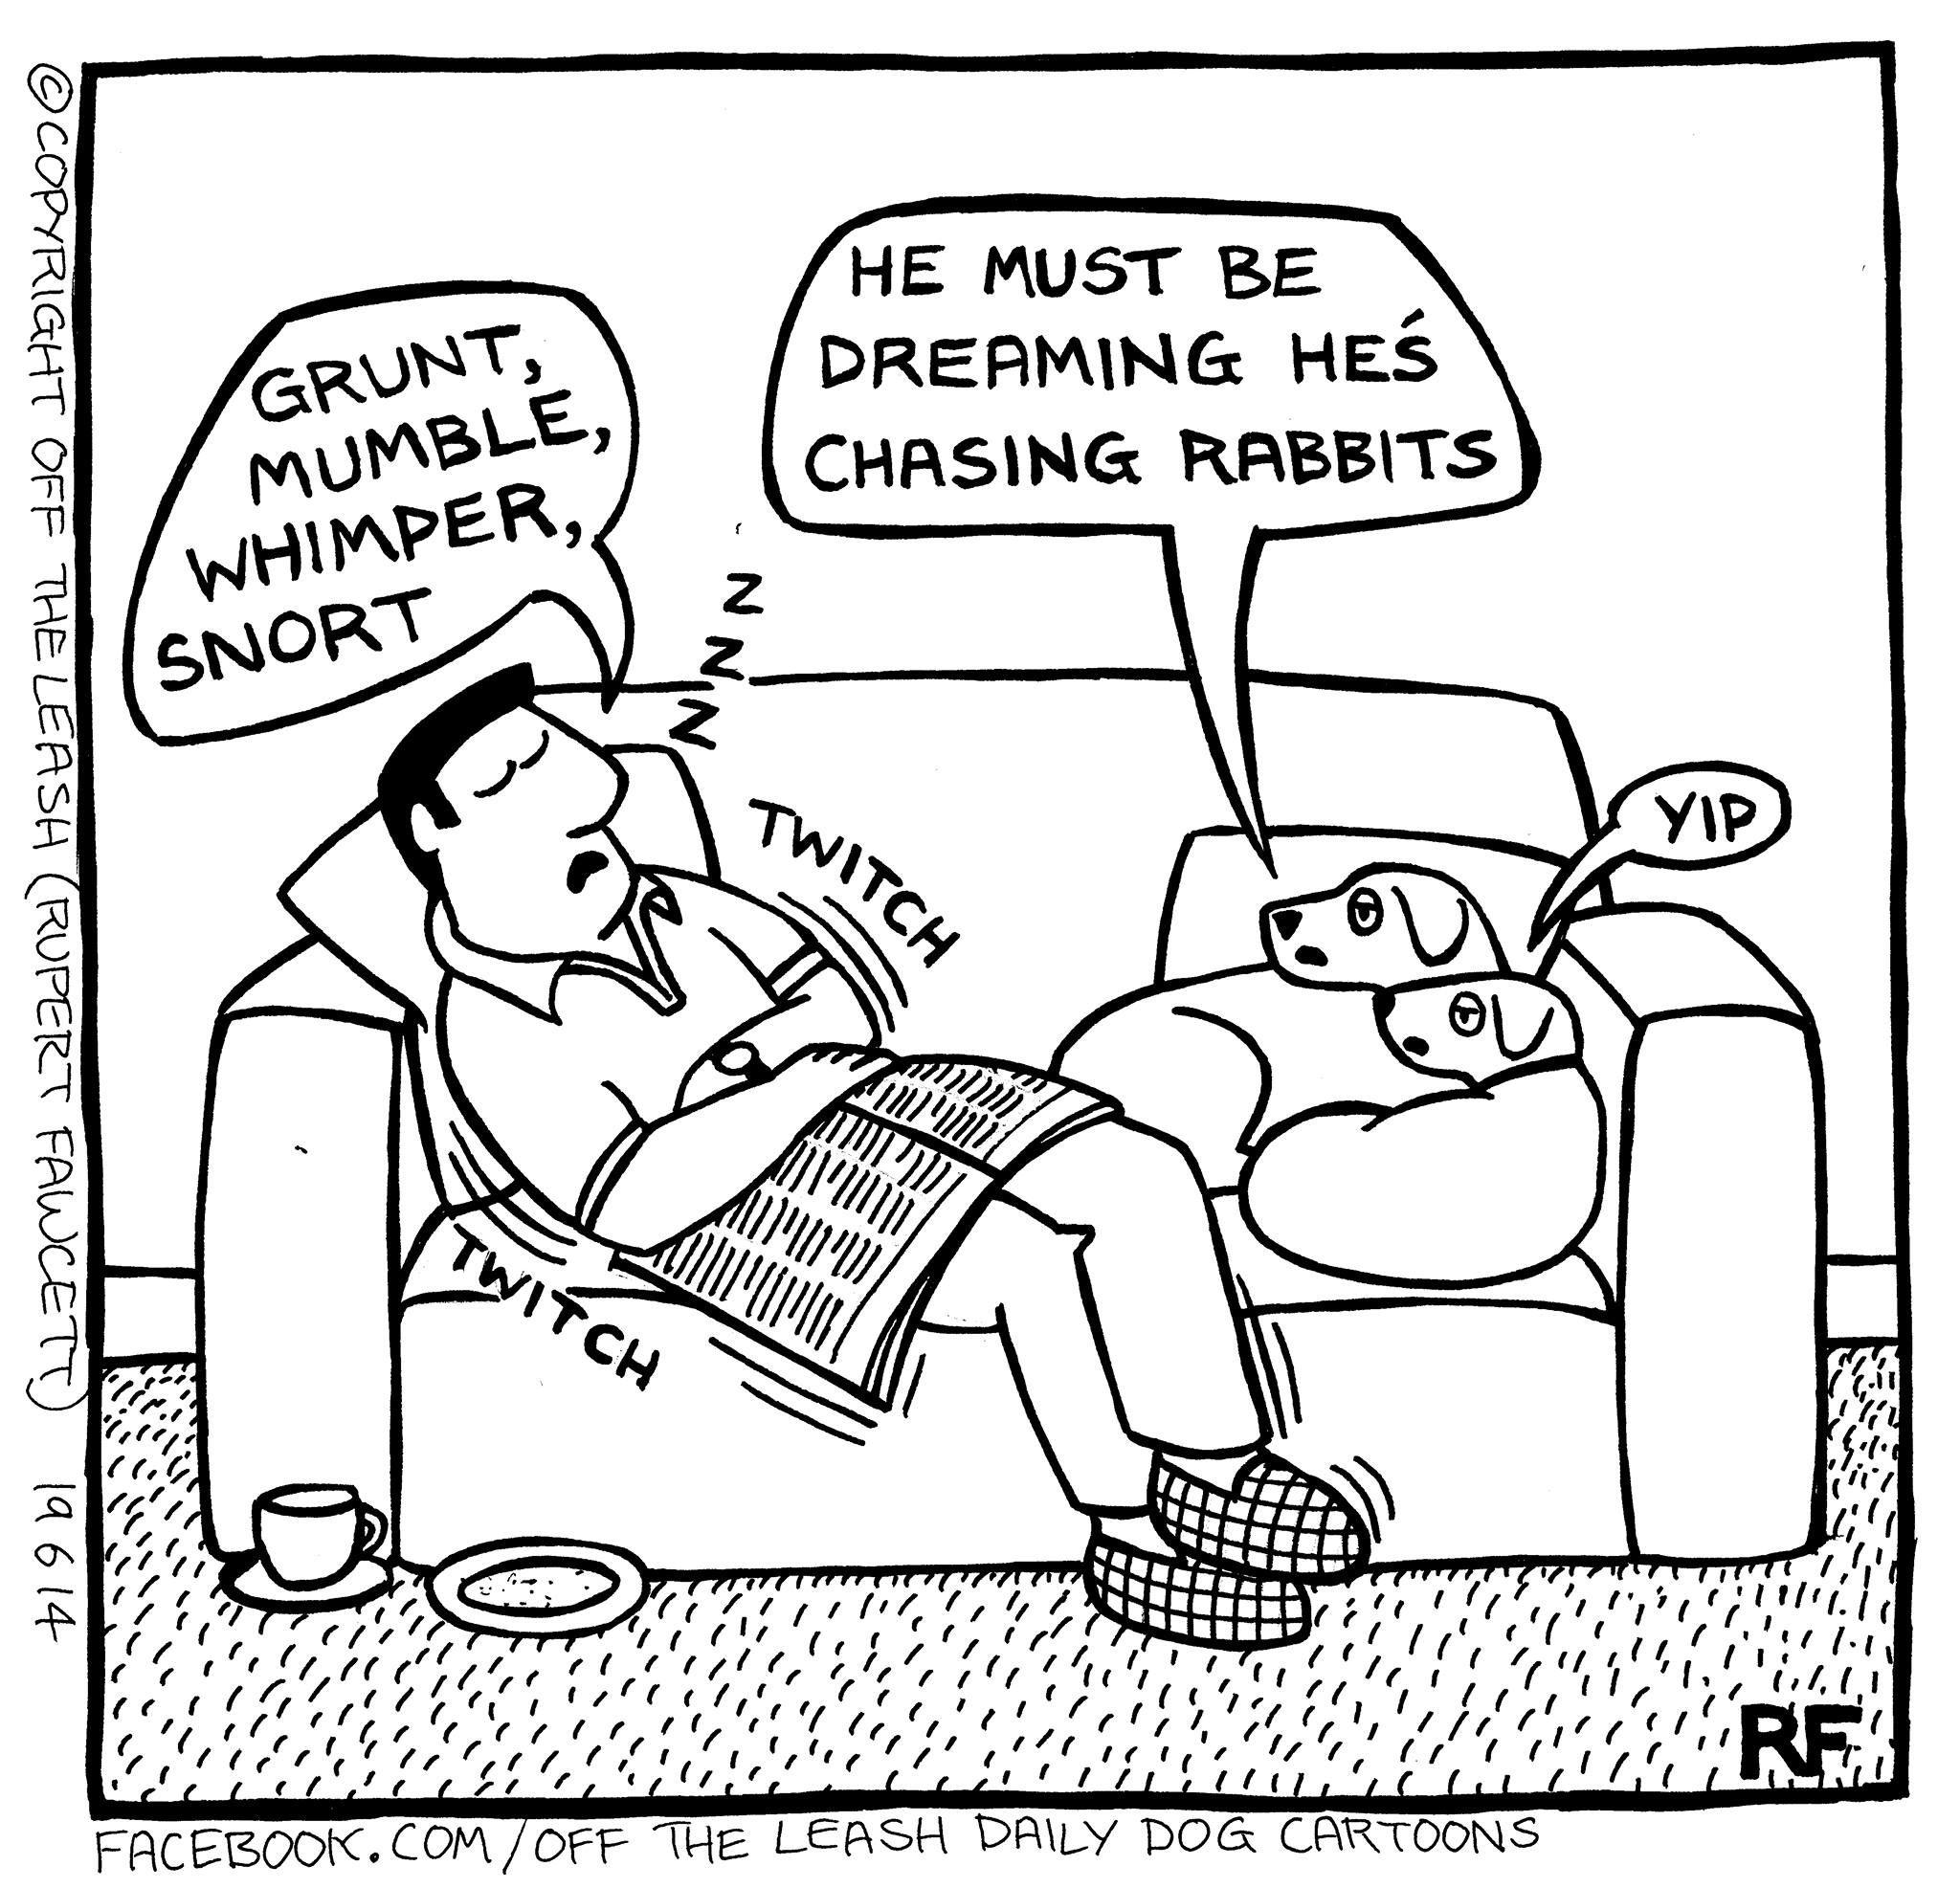 sofa king joke interior design white leather off the leash dog cartoons pinterest doggies